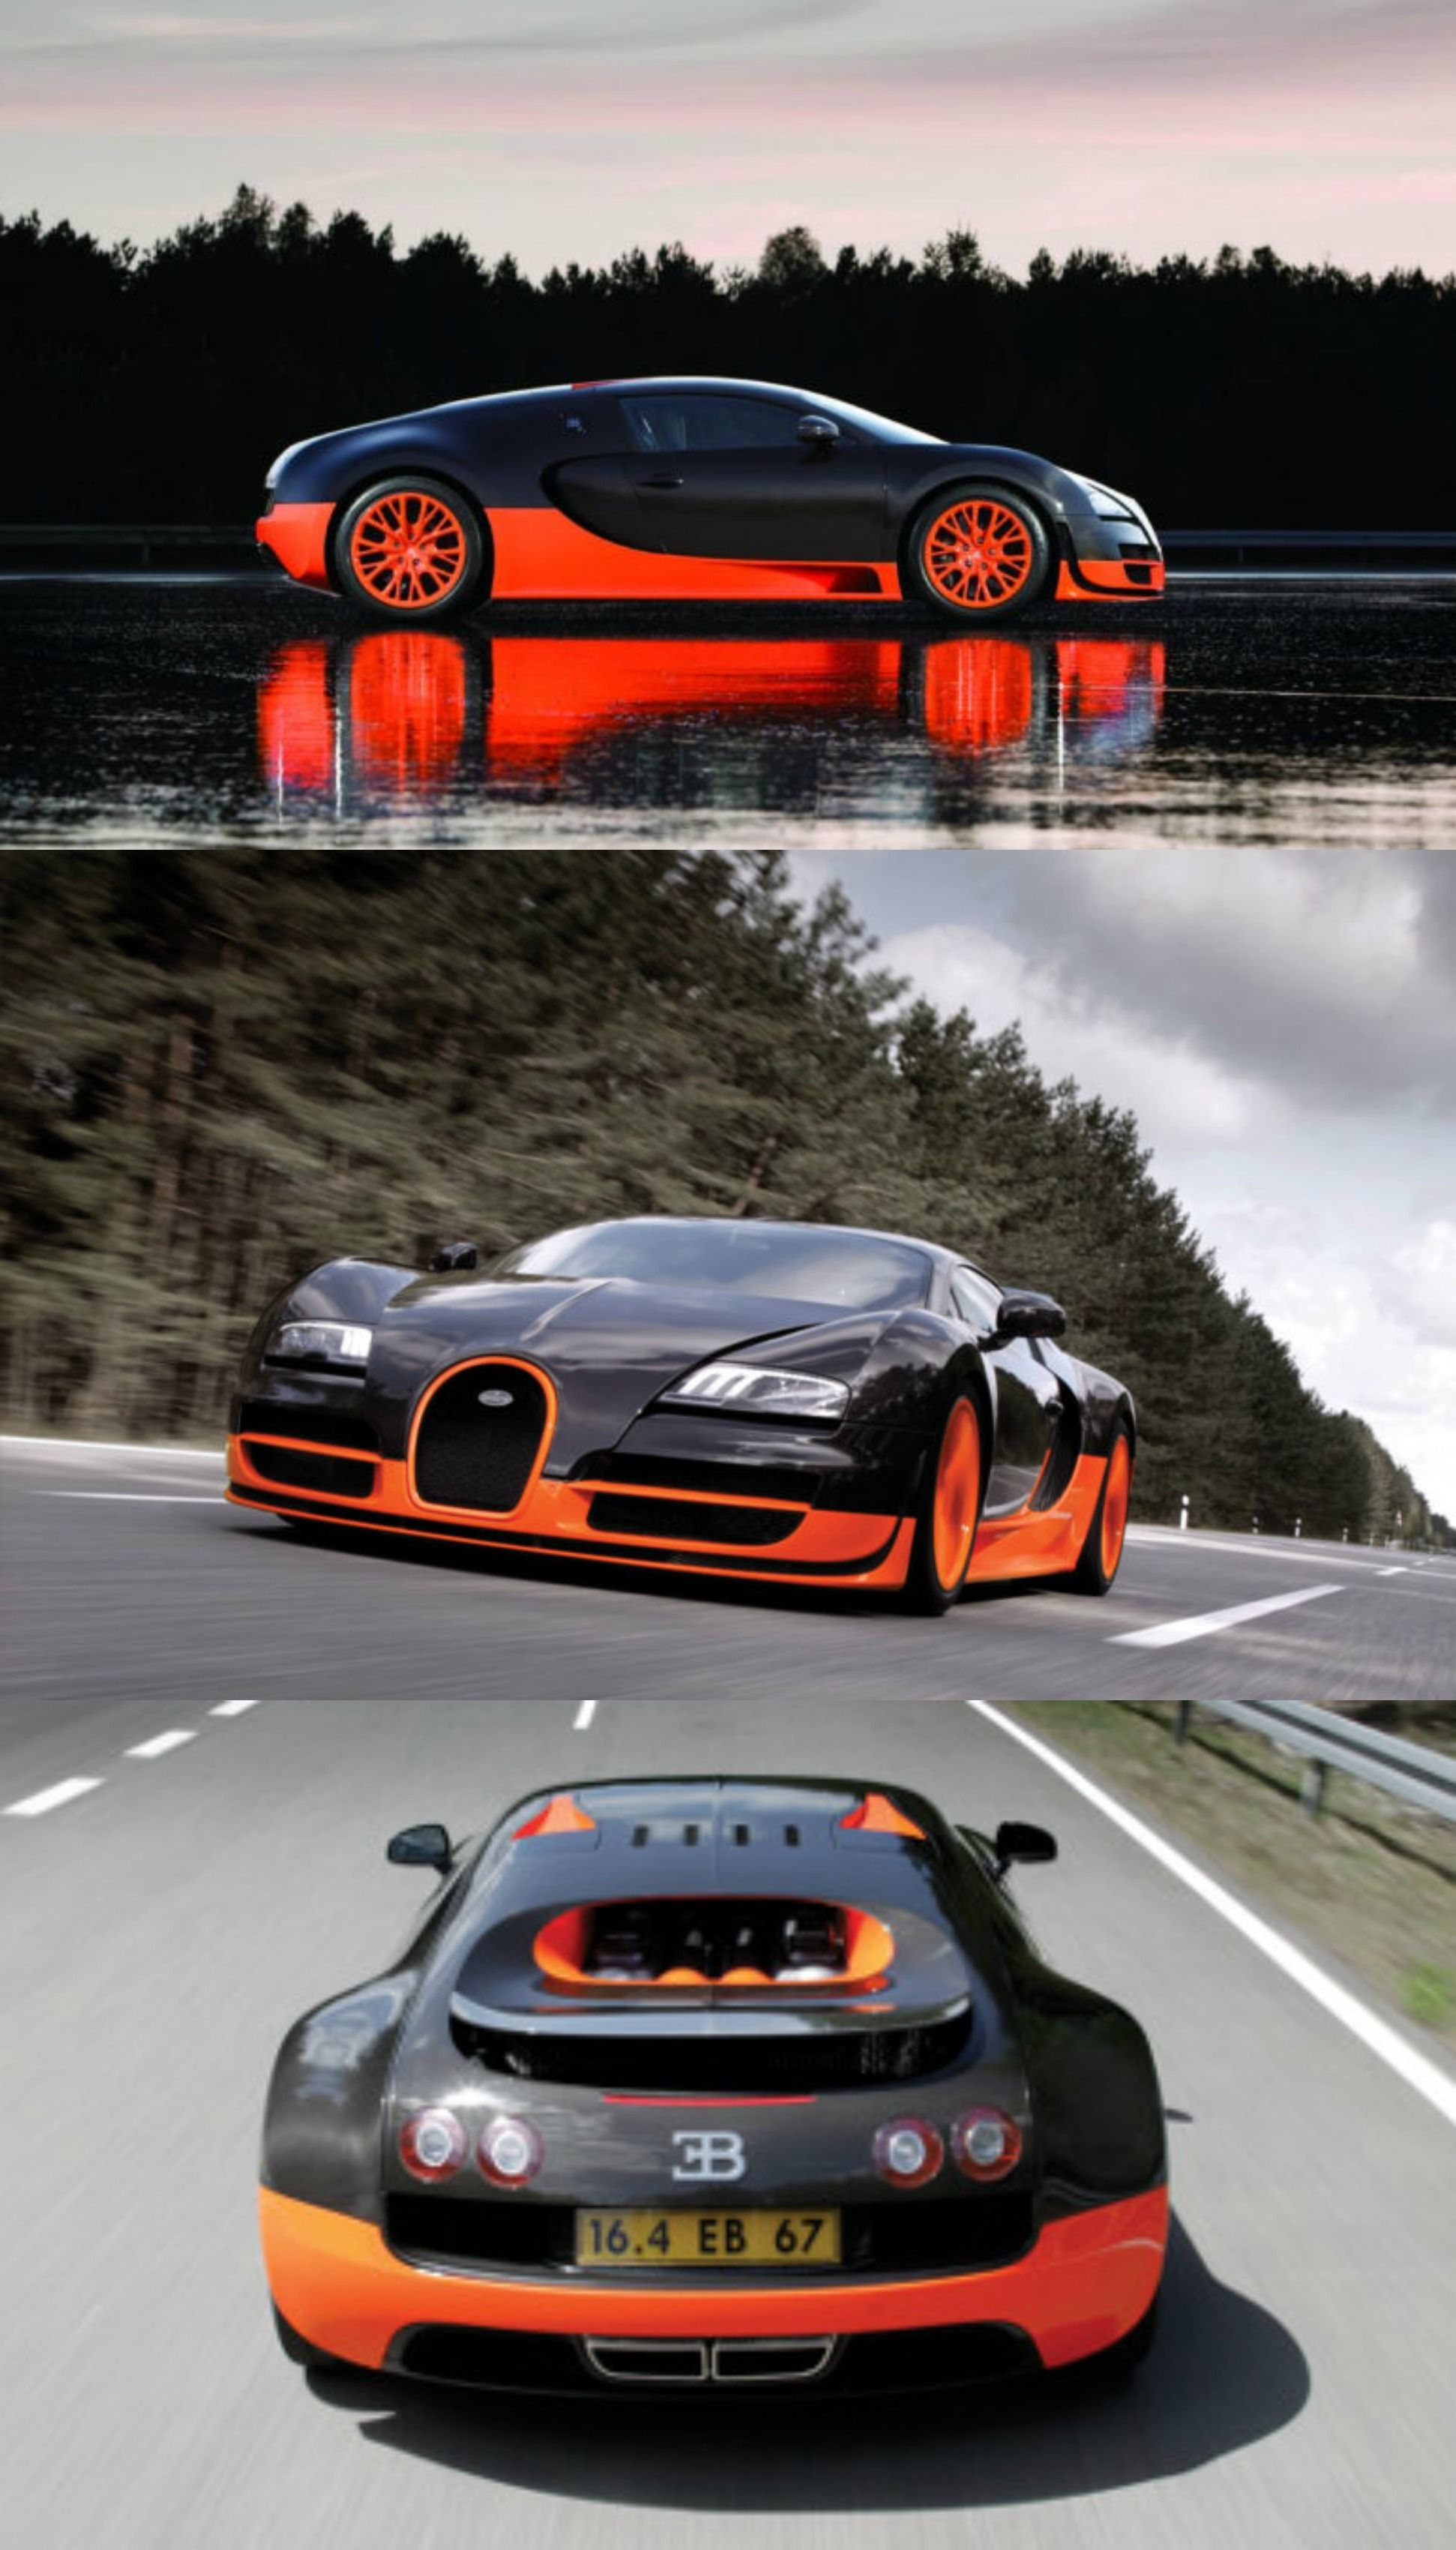 f58cf23c7576c878a1d17536c73b0dab Surprising Bugatti Veyron 16.4 Grand Sport Vitesse Acceleration Cars Trend